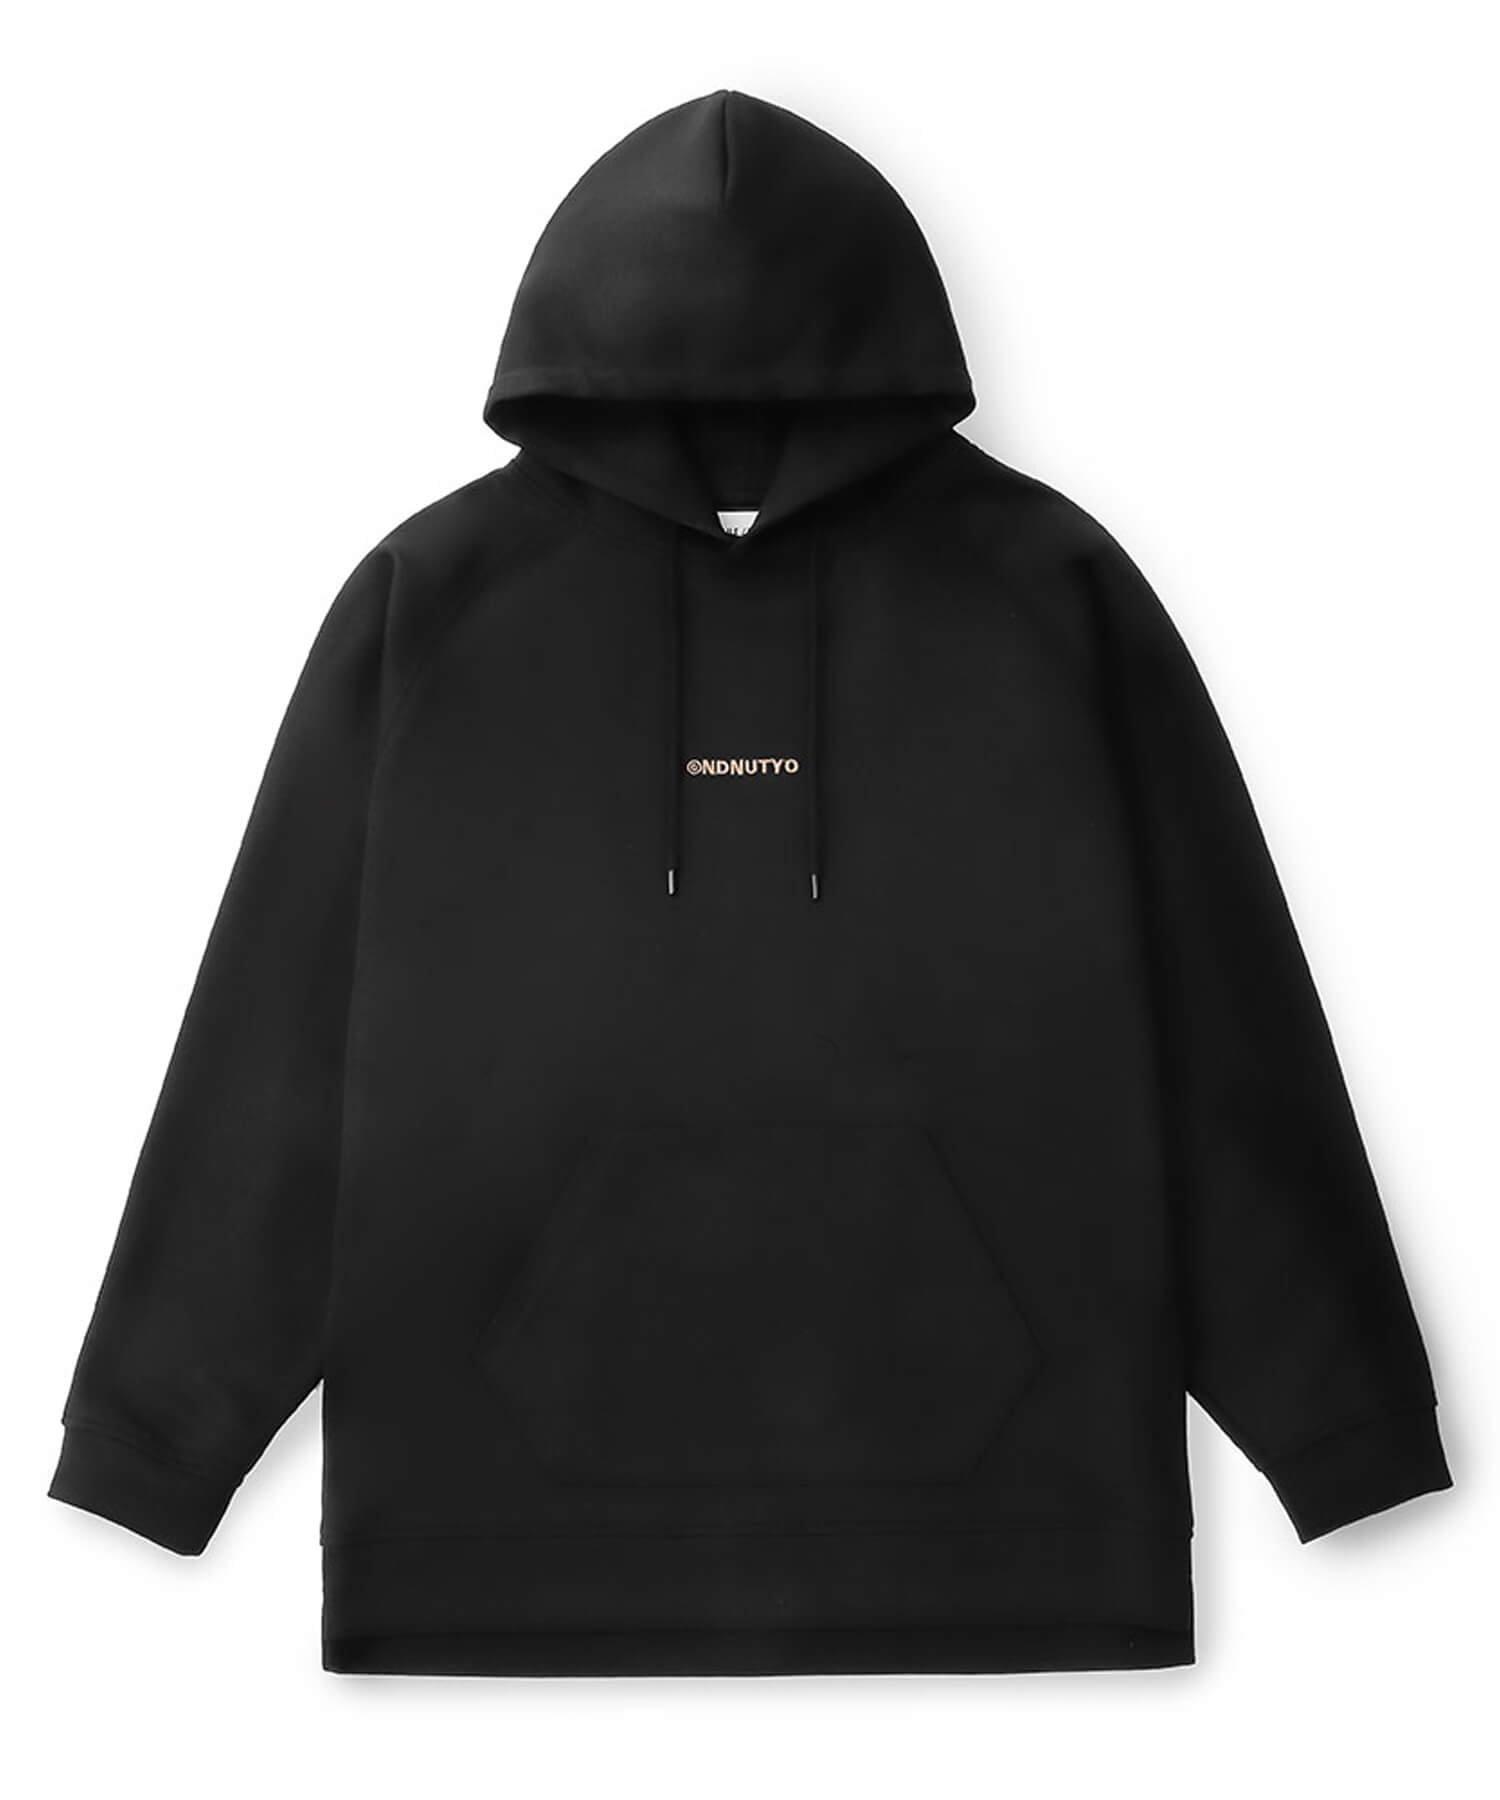 NIL DUE / NIL UN TOKYO / ニル デュエ / ニル アン トーキョー | EMBROIDERY LOGO HOODIE (BLACK) 商品画像1